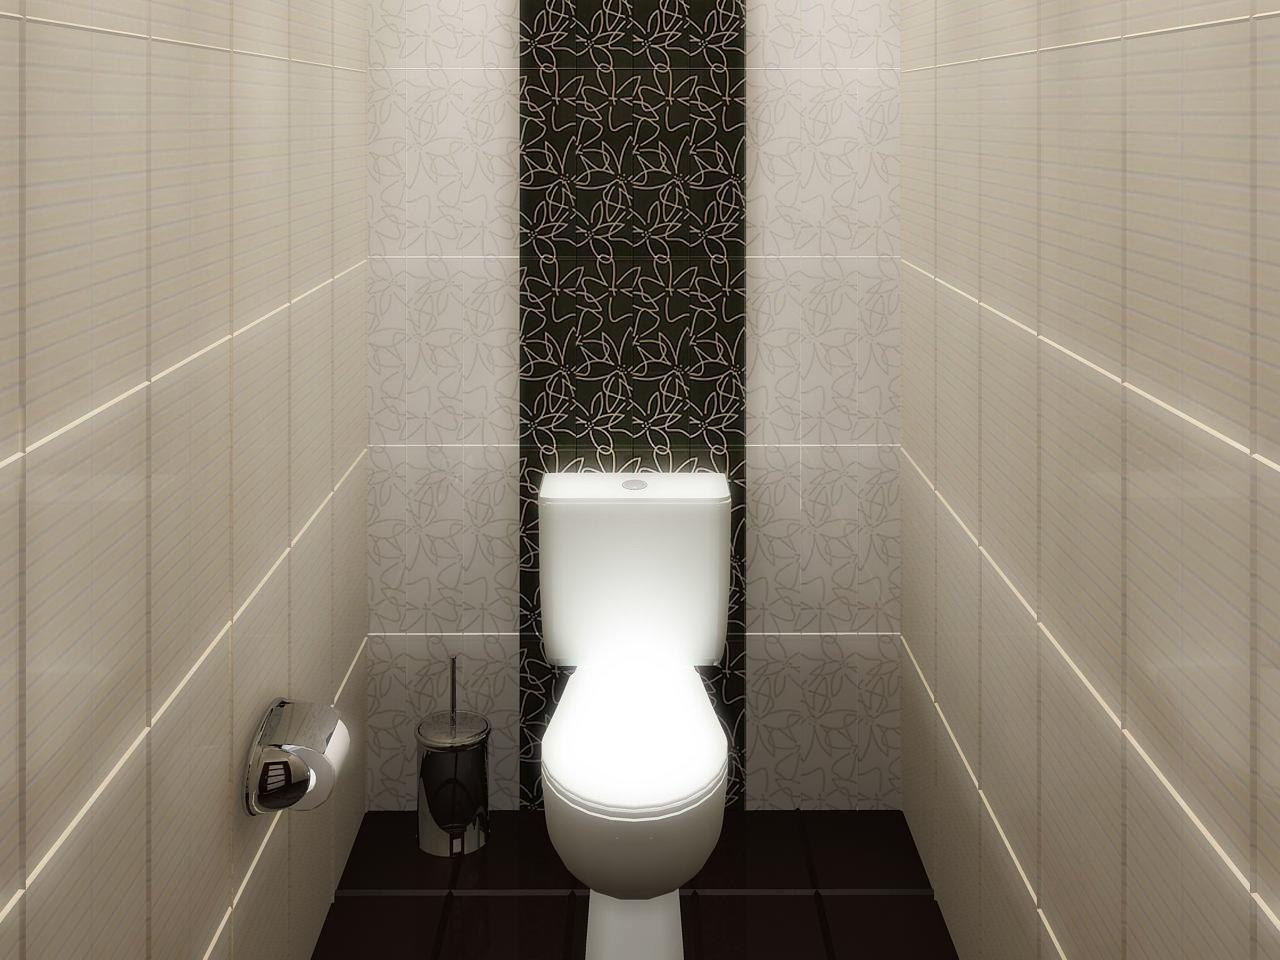 Интерьер туалета в квартире фото